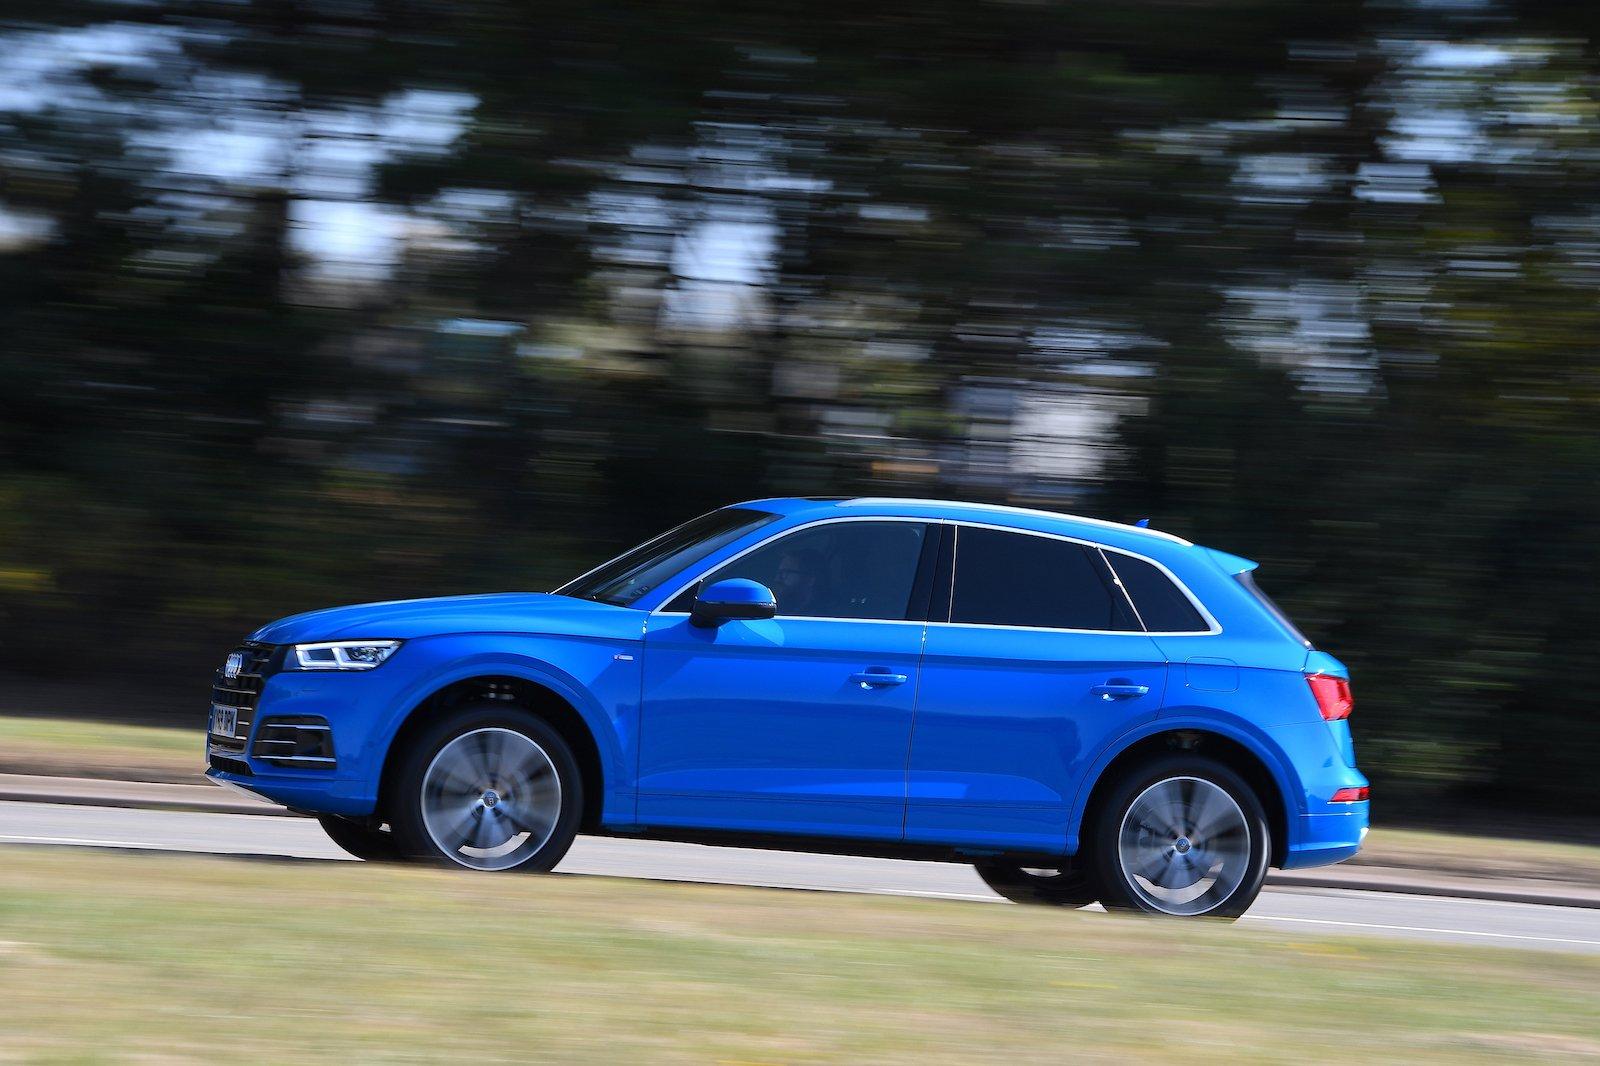 2019 Audi Q5 TFSI e panning